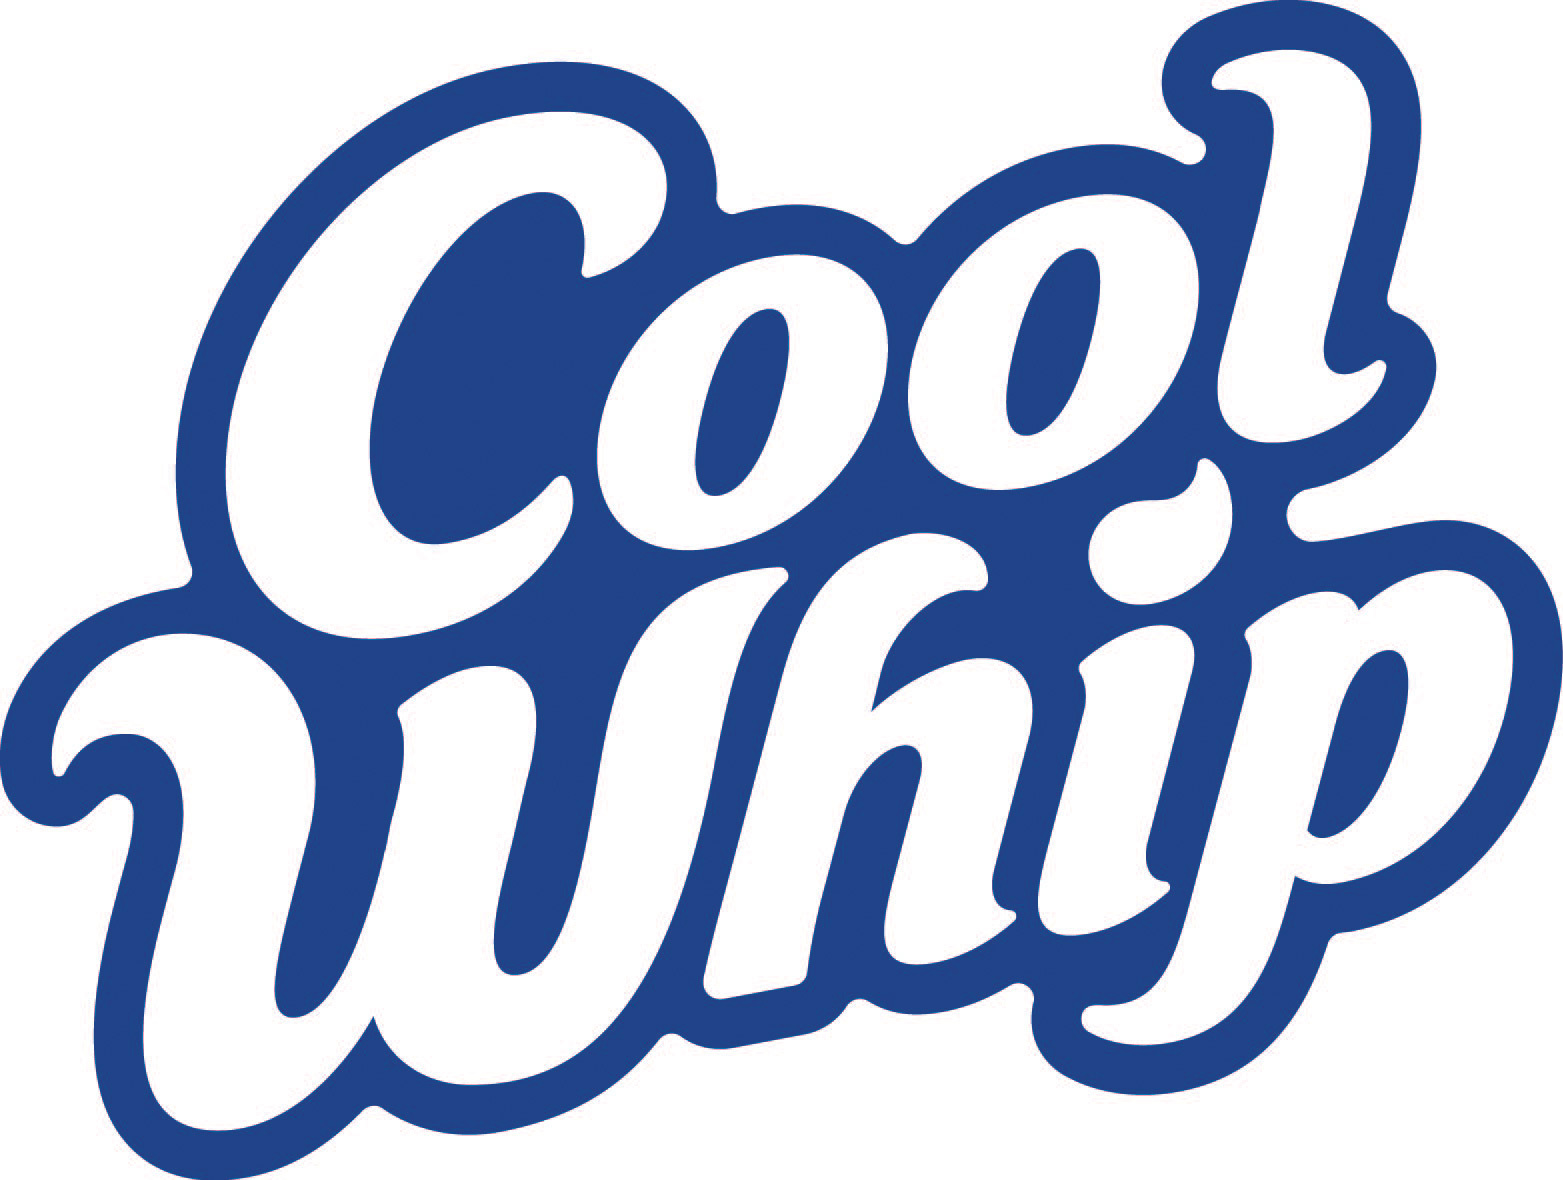 Fullsize Of Stewie Cool Whip